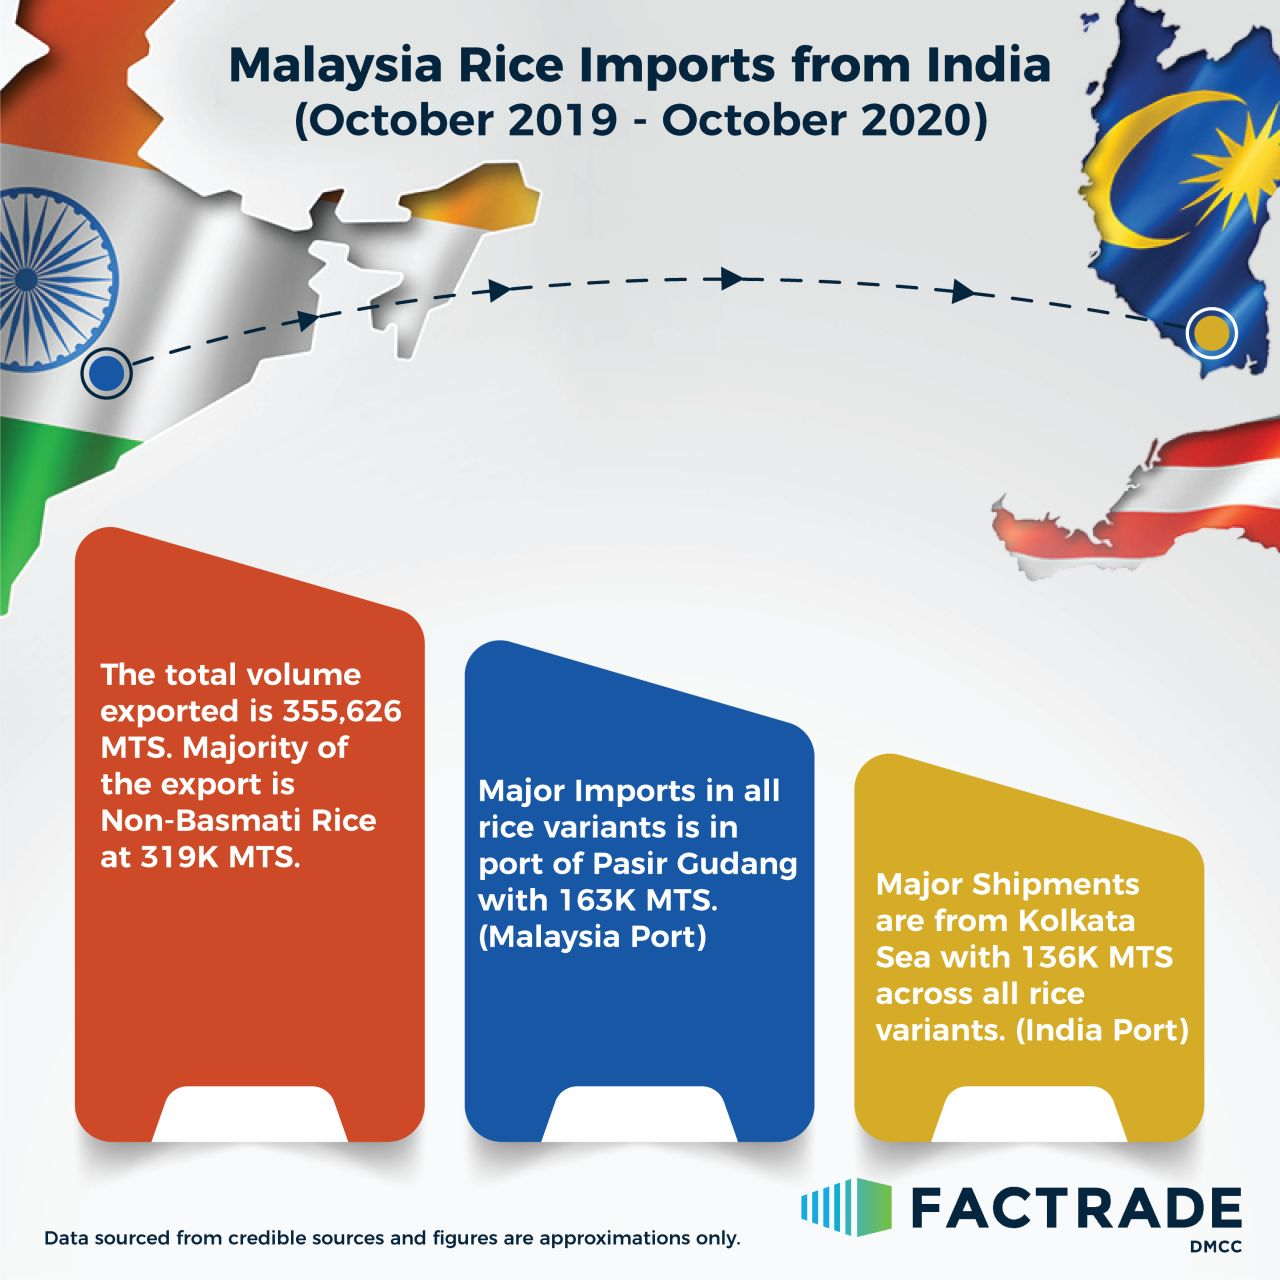 Malaysia Rice Imports from India